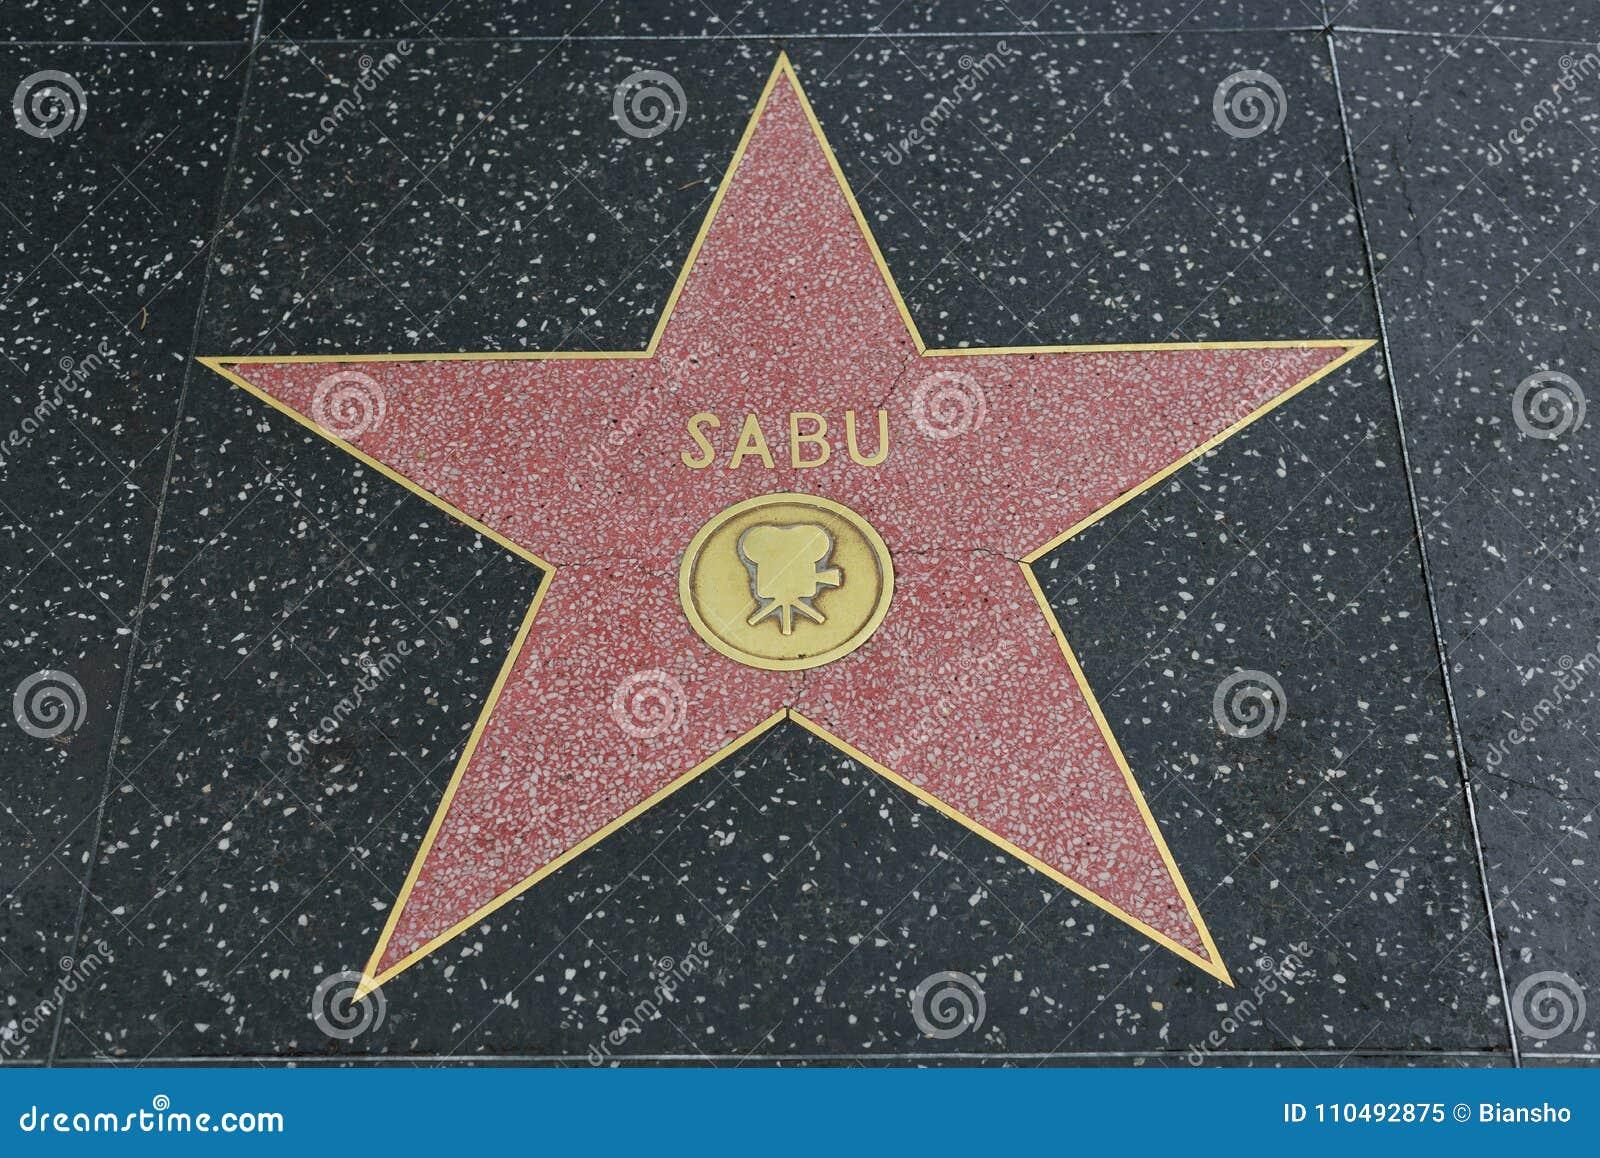 Sabu star on the Hollywood Walk of Fame